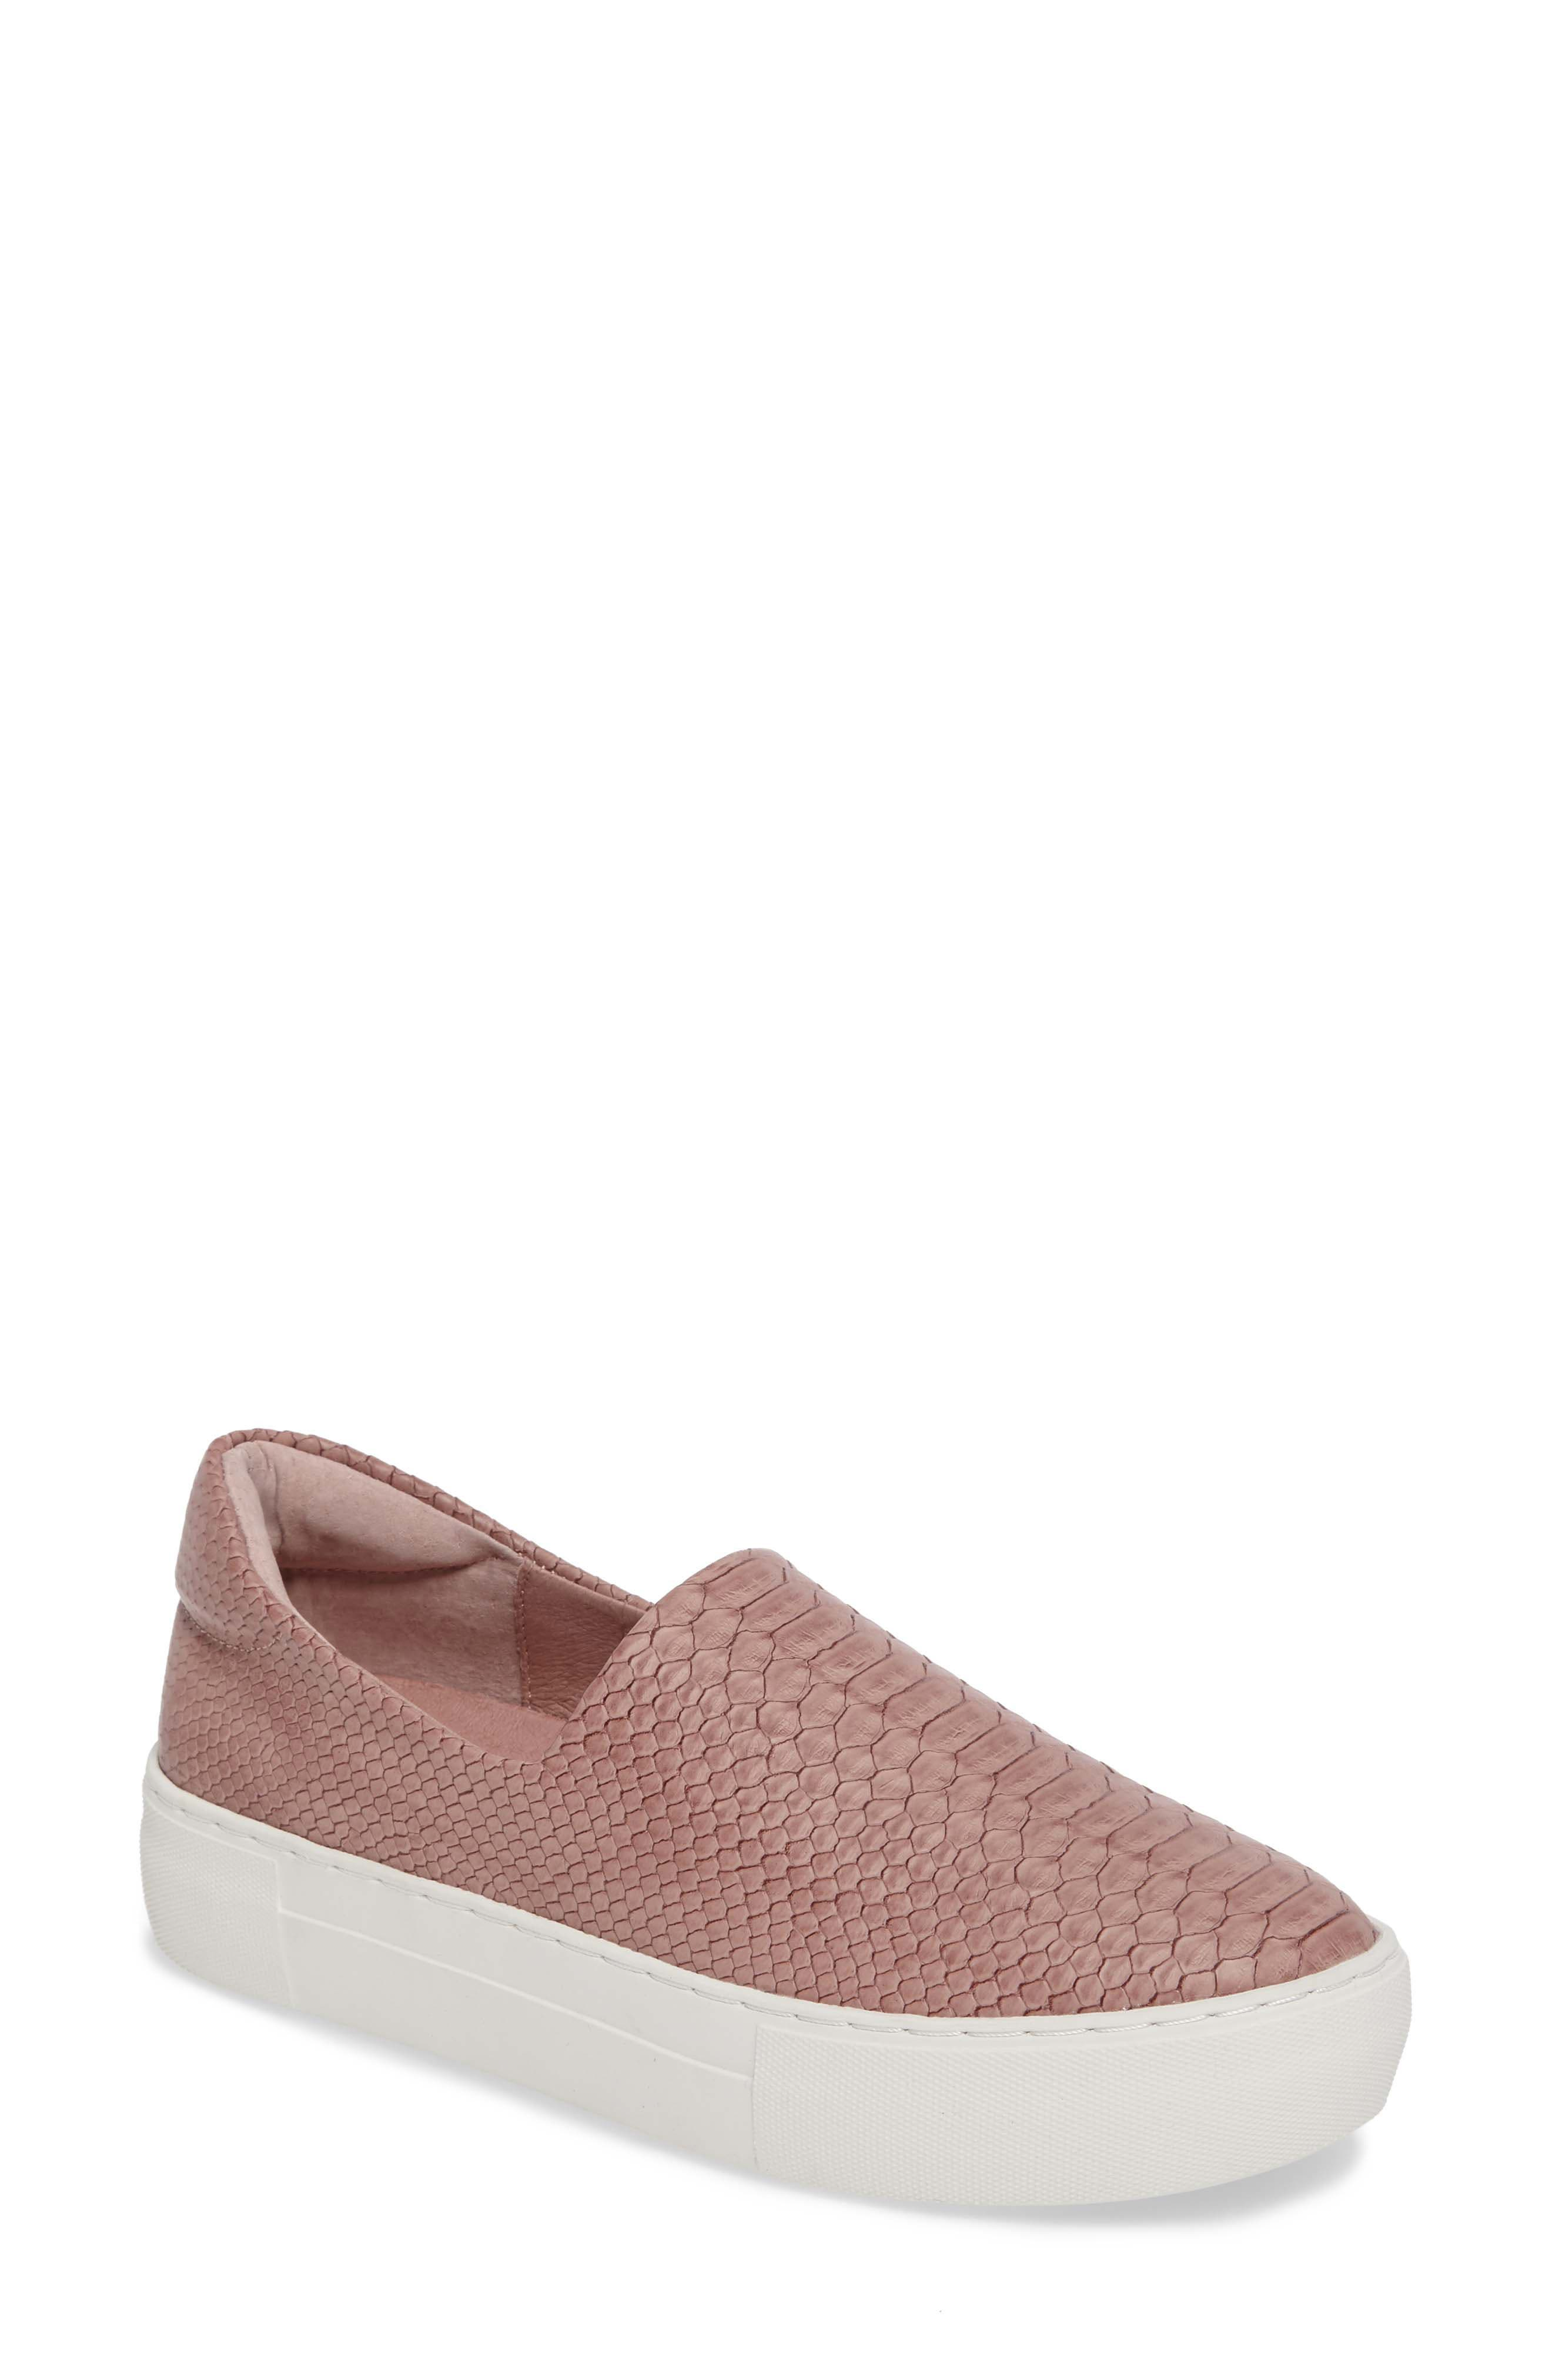 Main Image - JSlides 'Ariana' Platform Sneaker (Women)